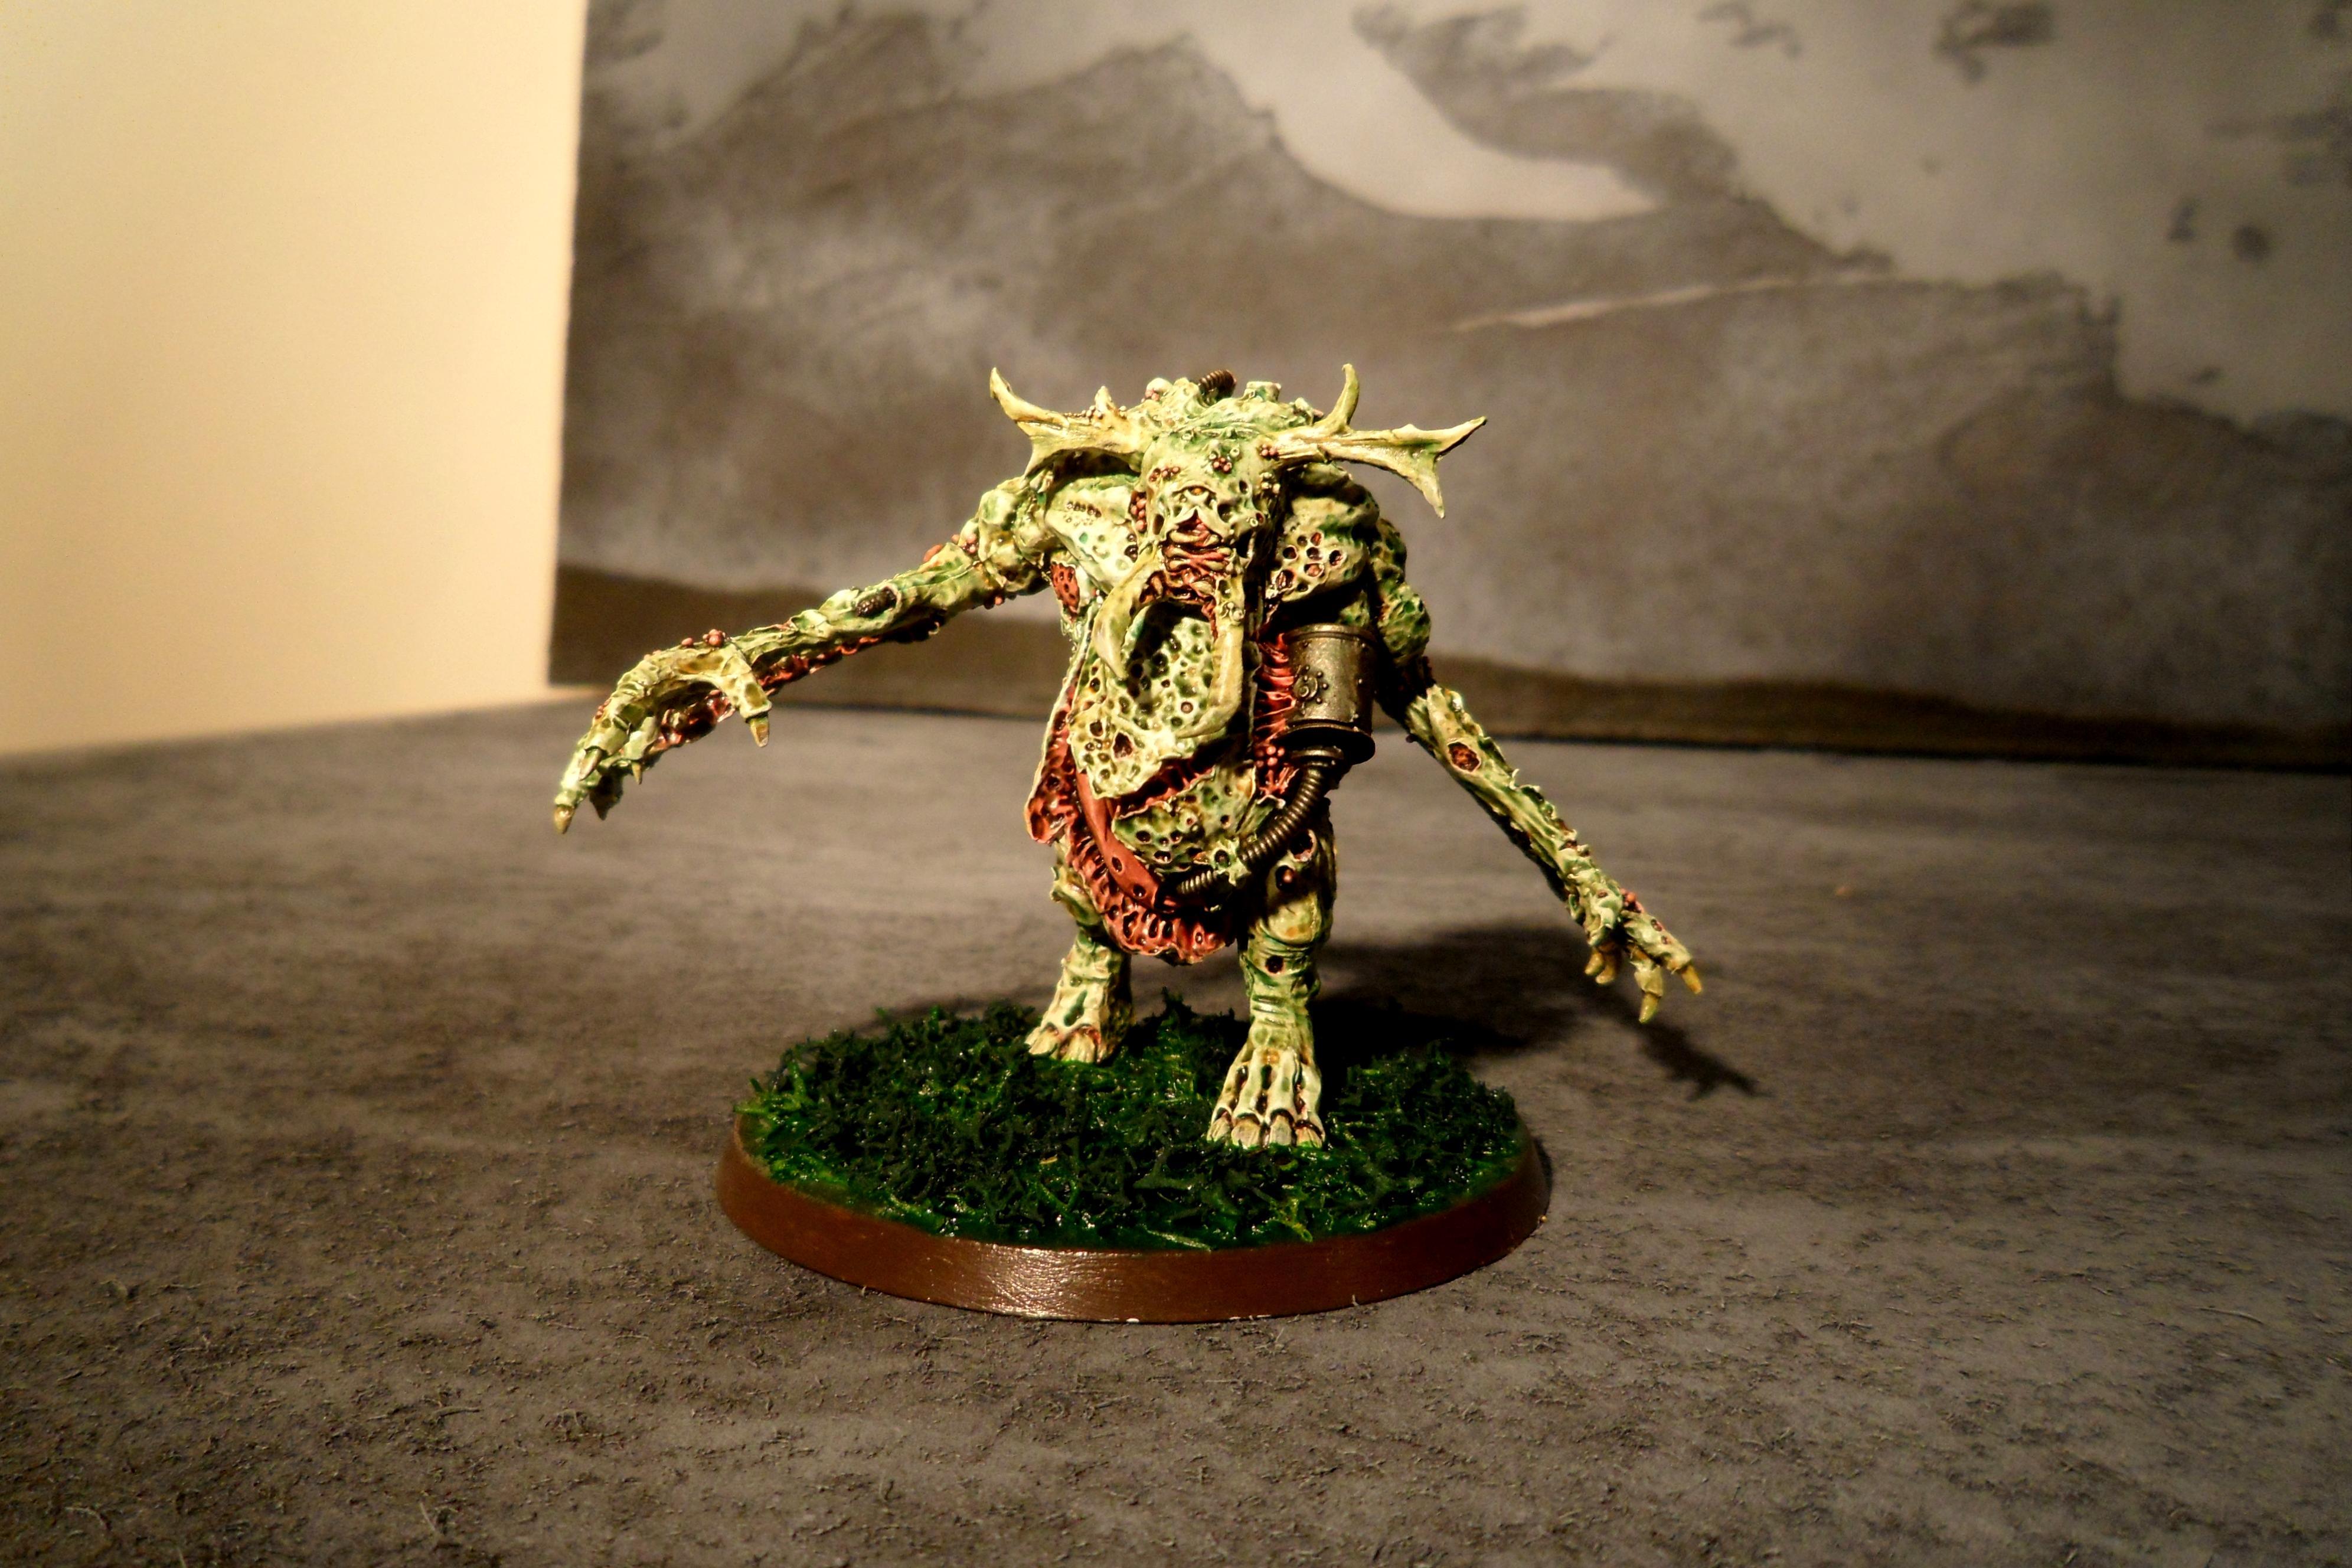 Conversion, Daemon Prince, Nurgle, Nurgle Deamon Prince, Plague Ogre, Plague Orge, Warhammer 40,000